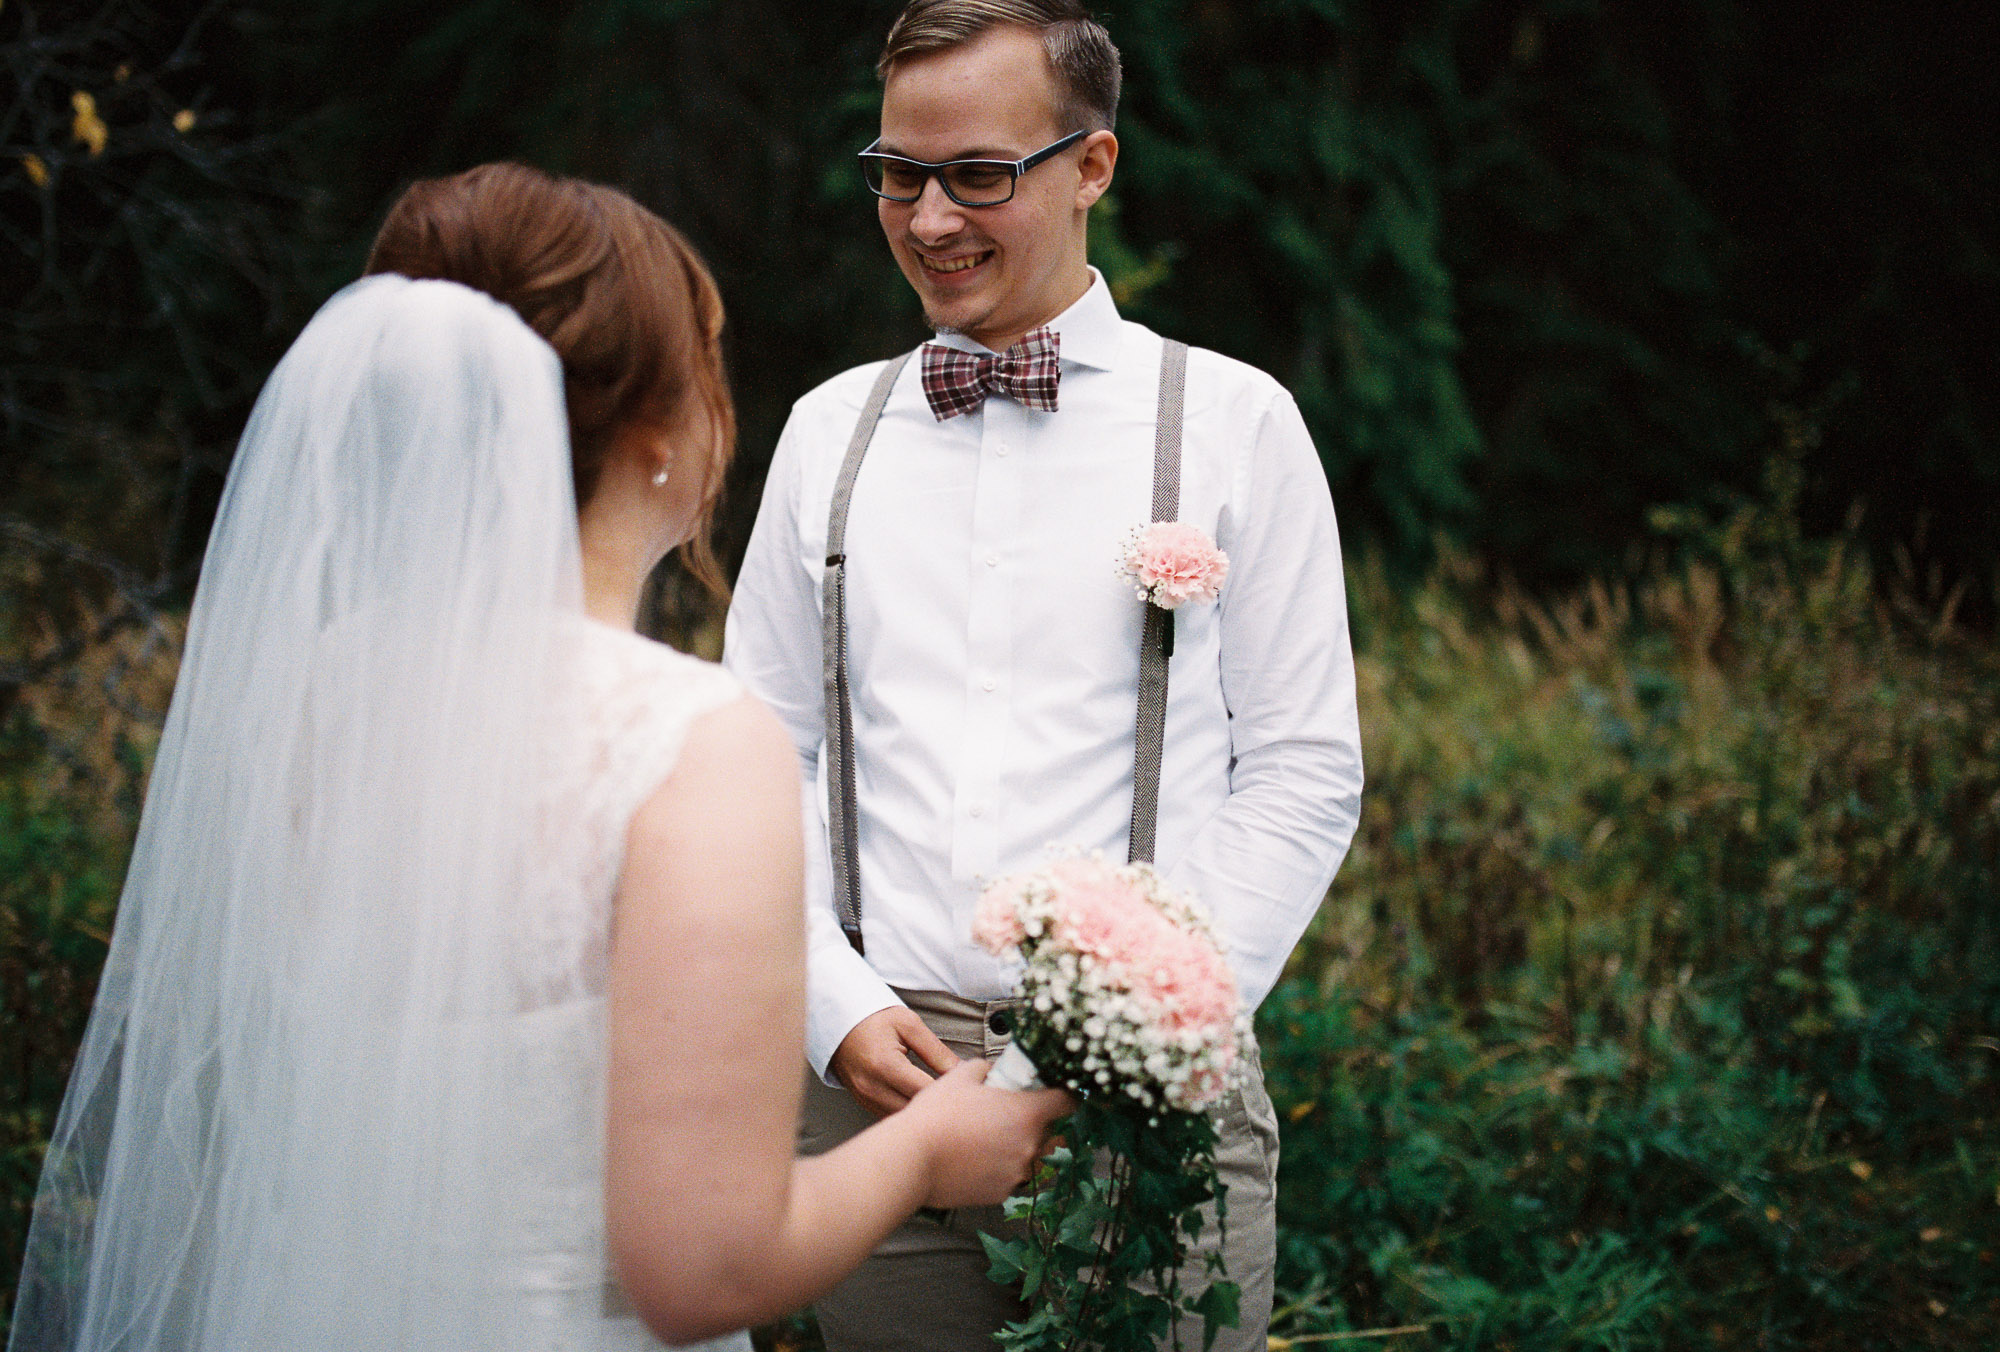 jere-satamo-analog-film-wedding-photographer-finland-072.jpg